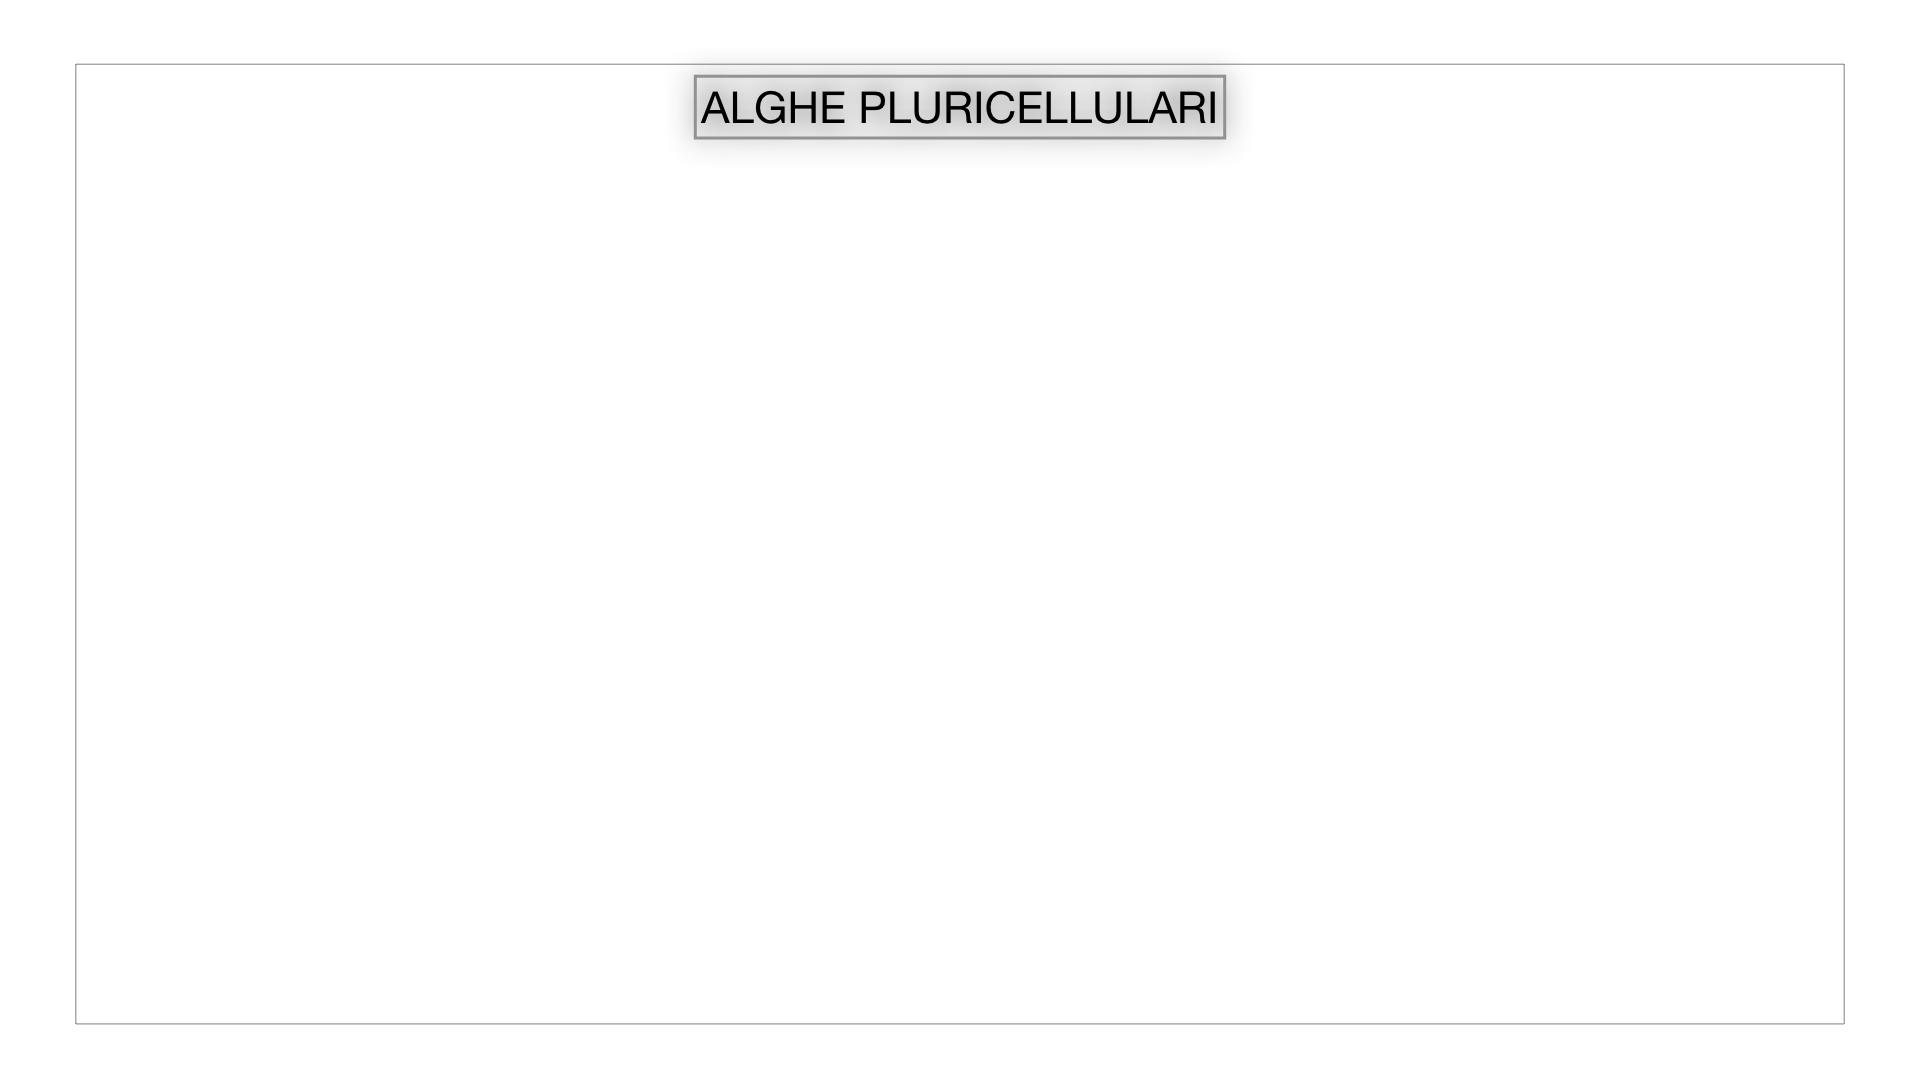 8. alghe uni_pluri_cellulari_SIMULAZIONE.023